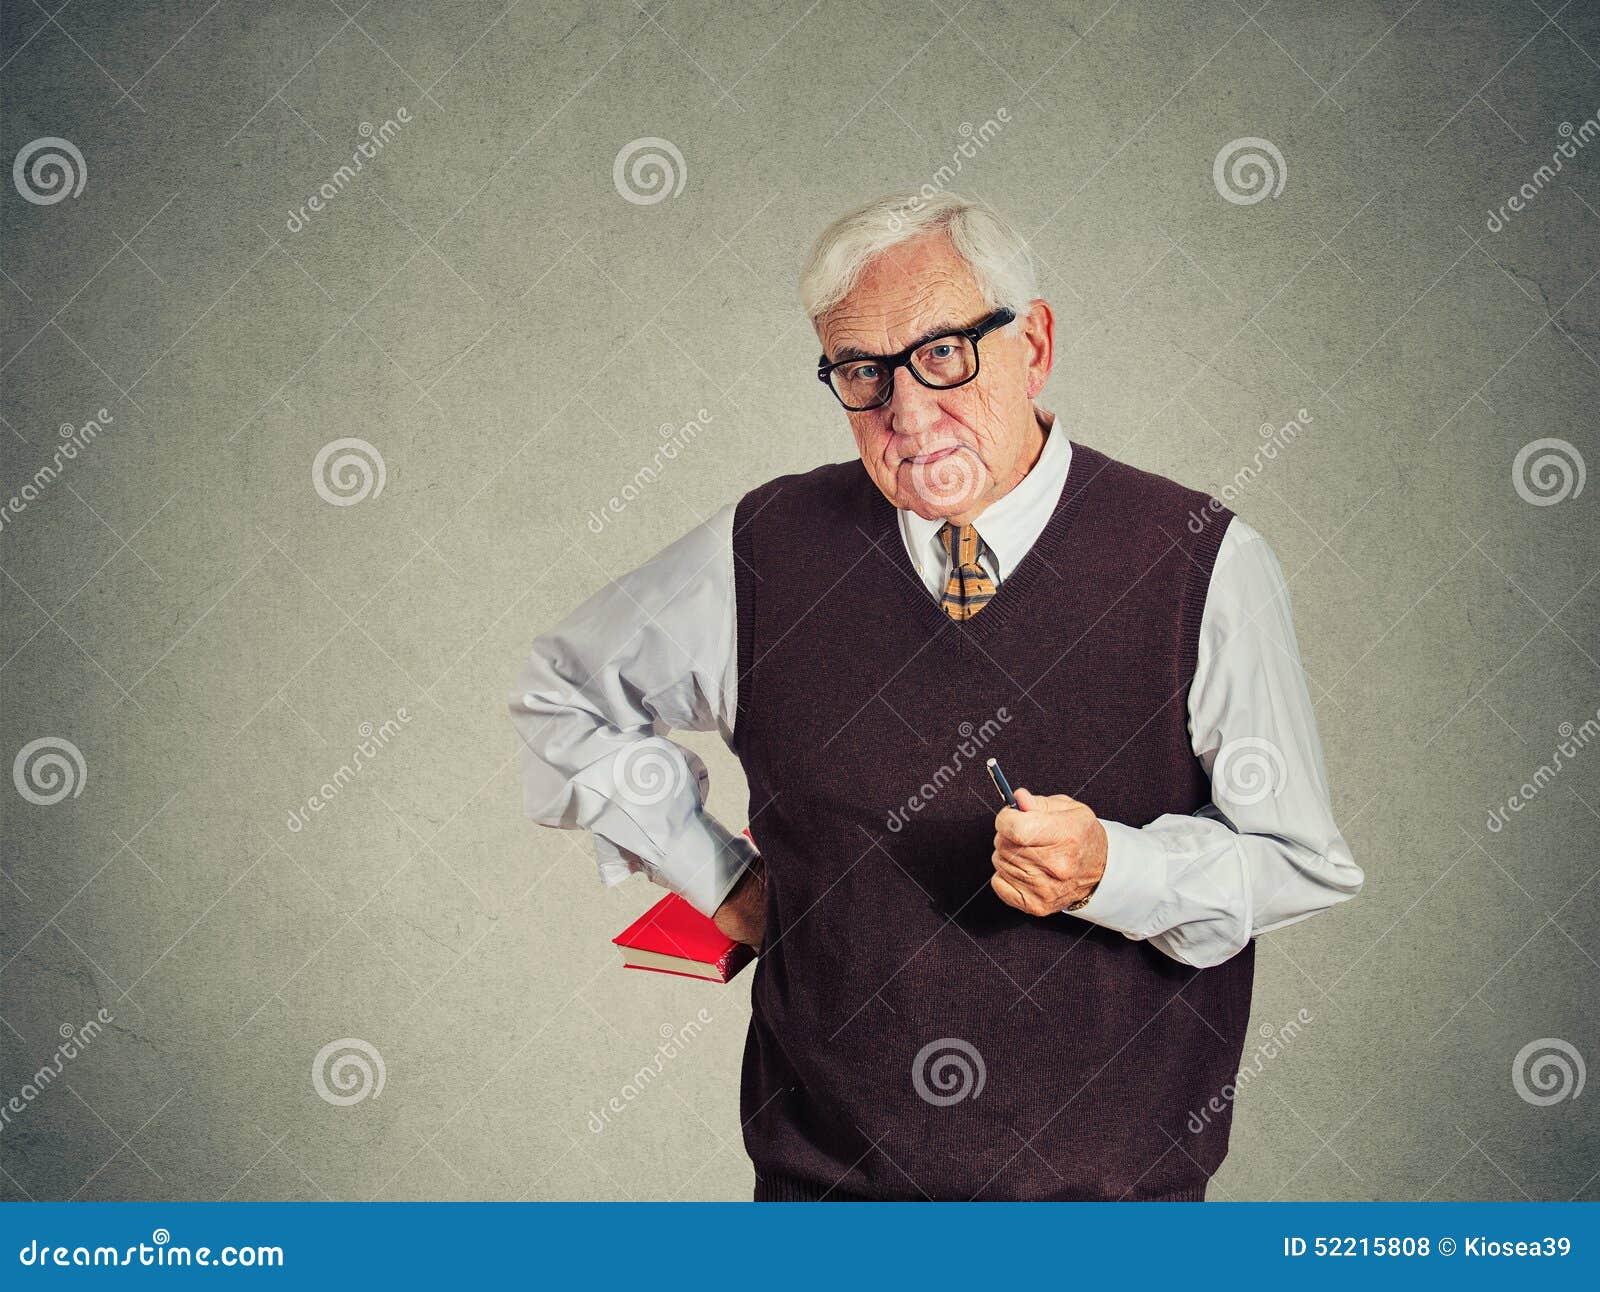 Serious senior strict teacher holding book and pen